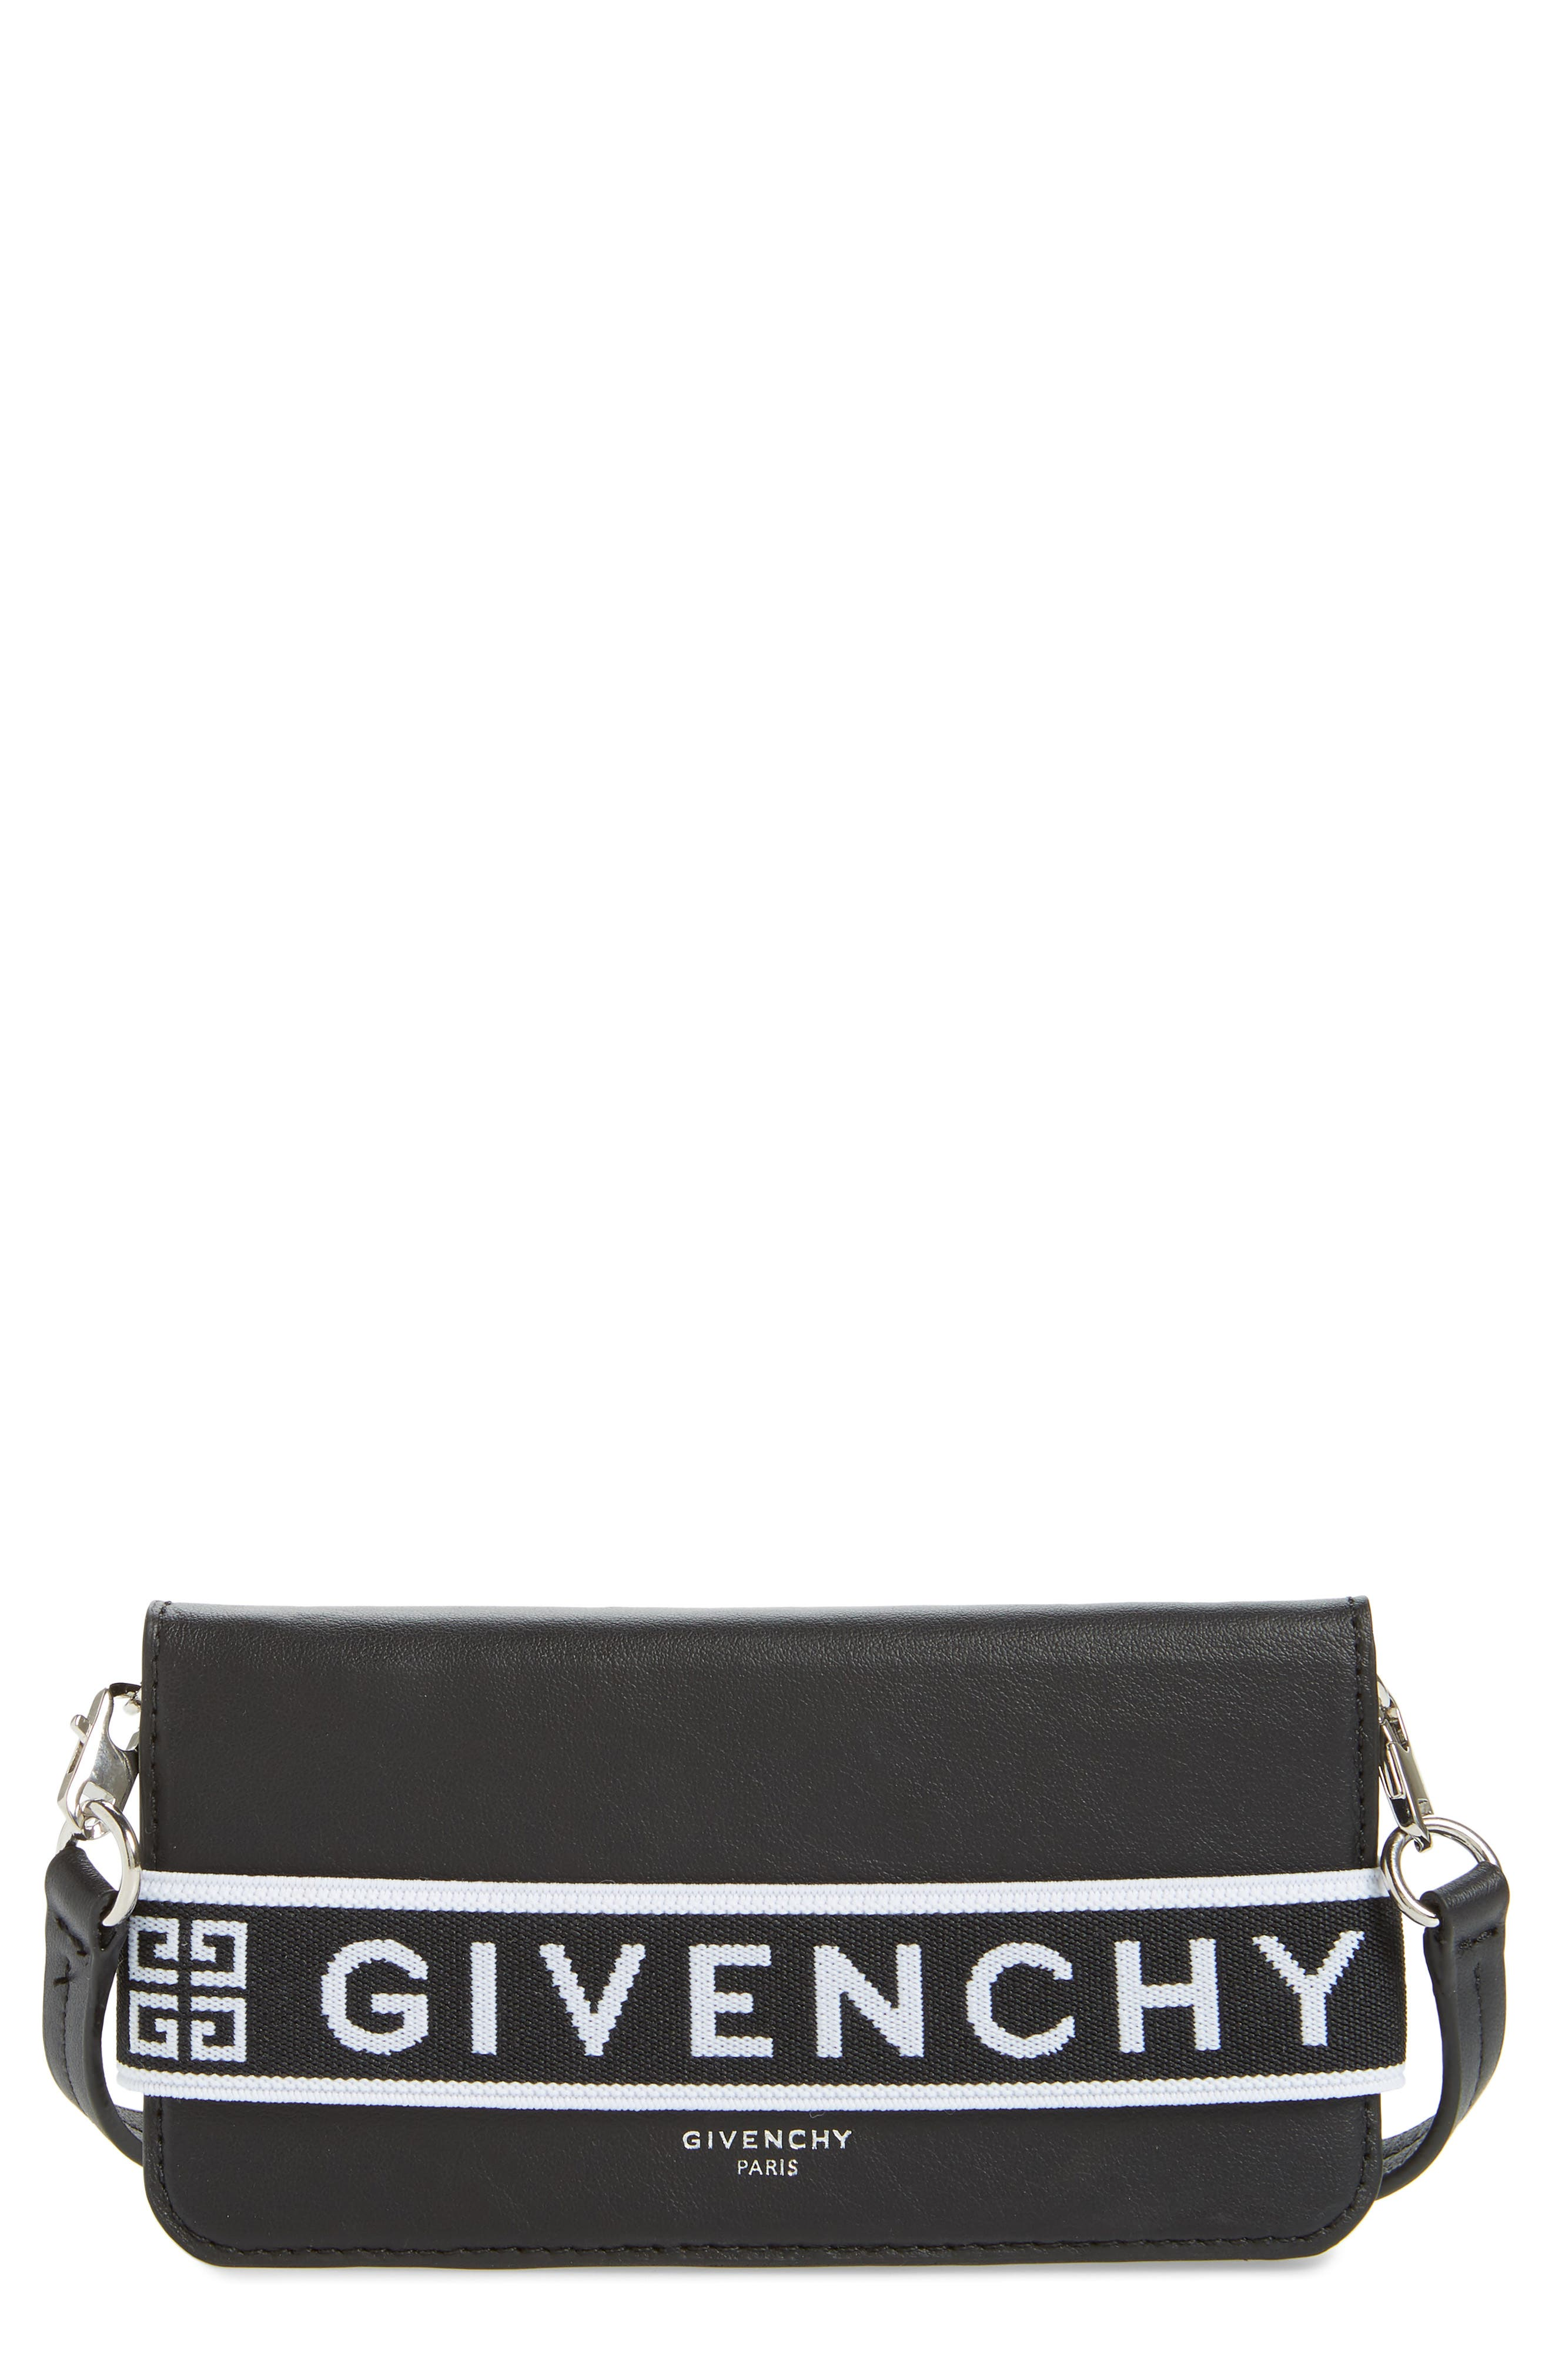 9f8d121c2a3e Phone Crossbody Handbags & Wallets for Women | Nordstrom